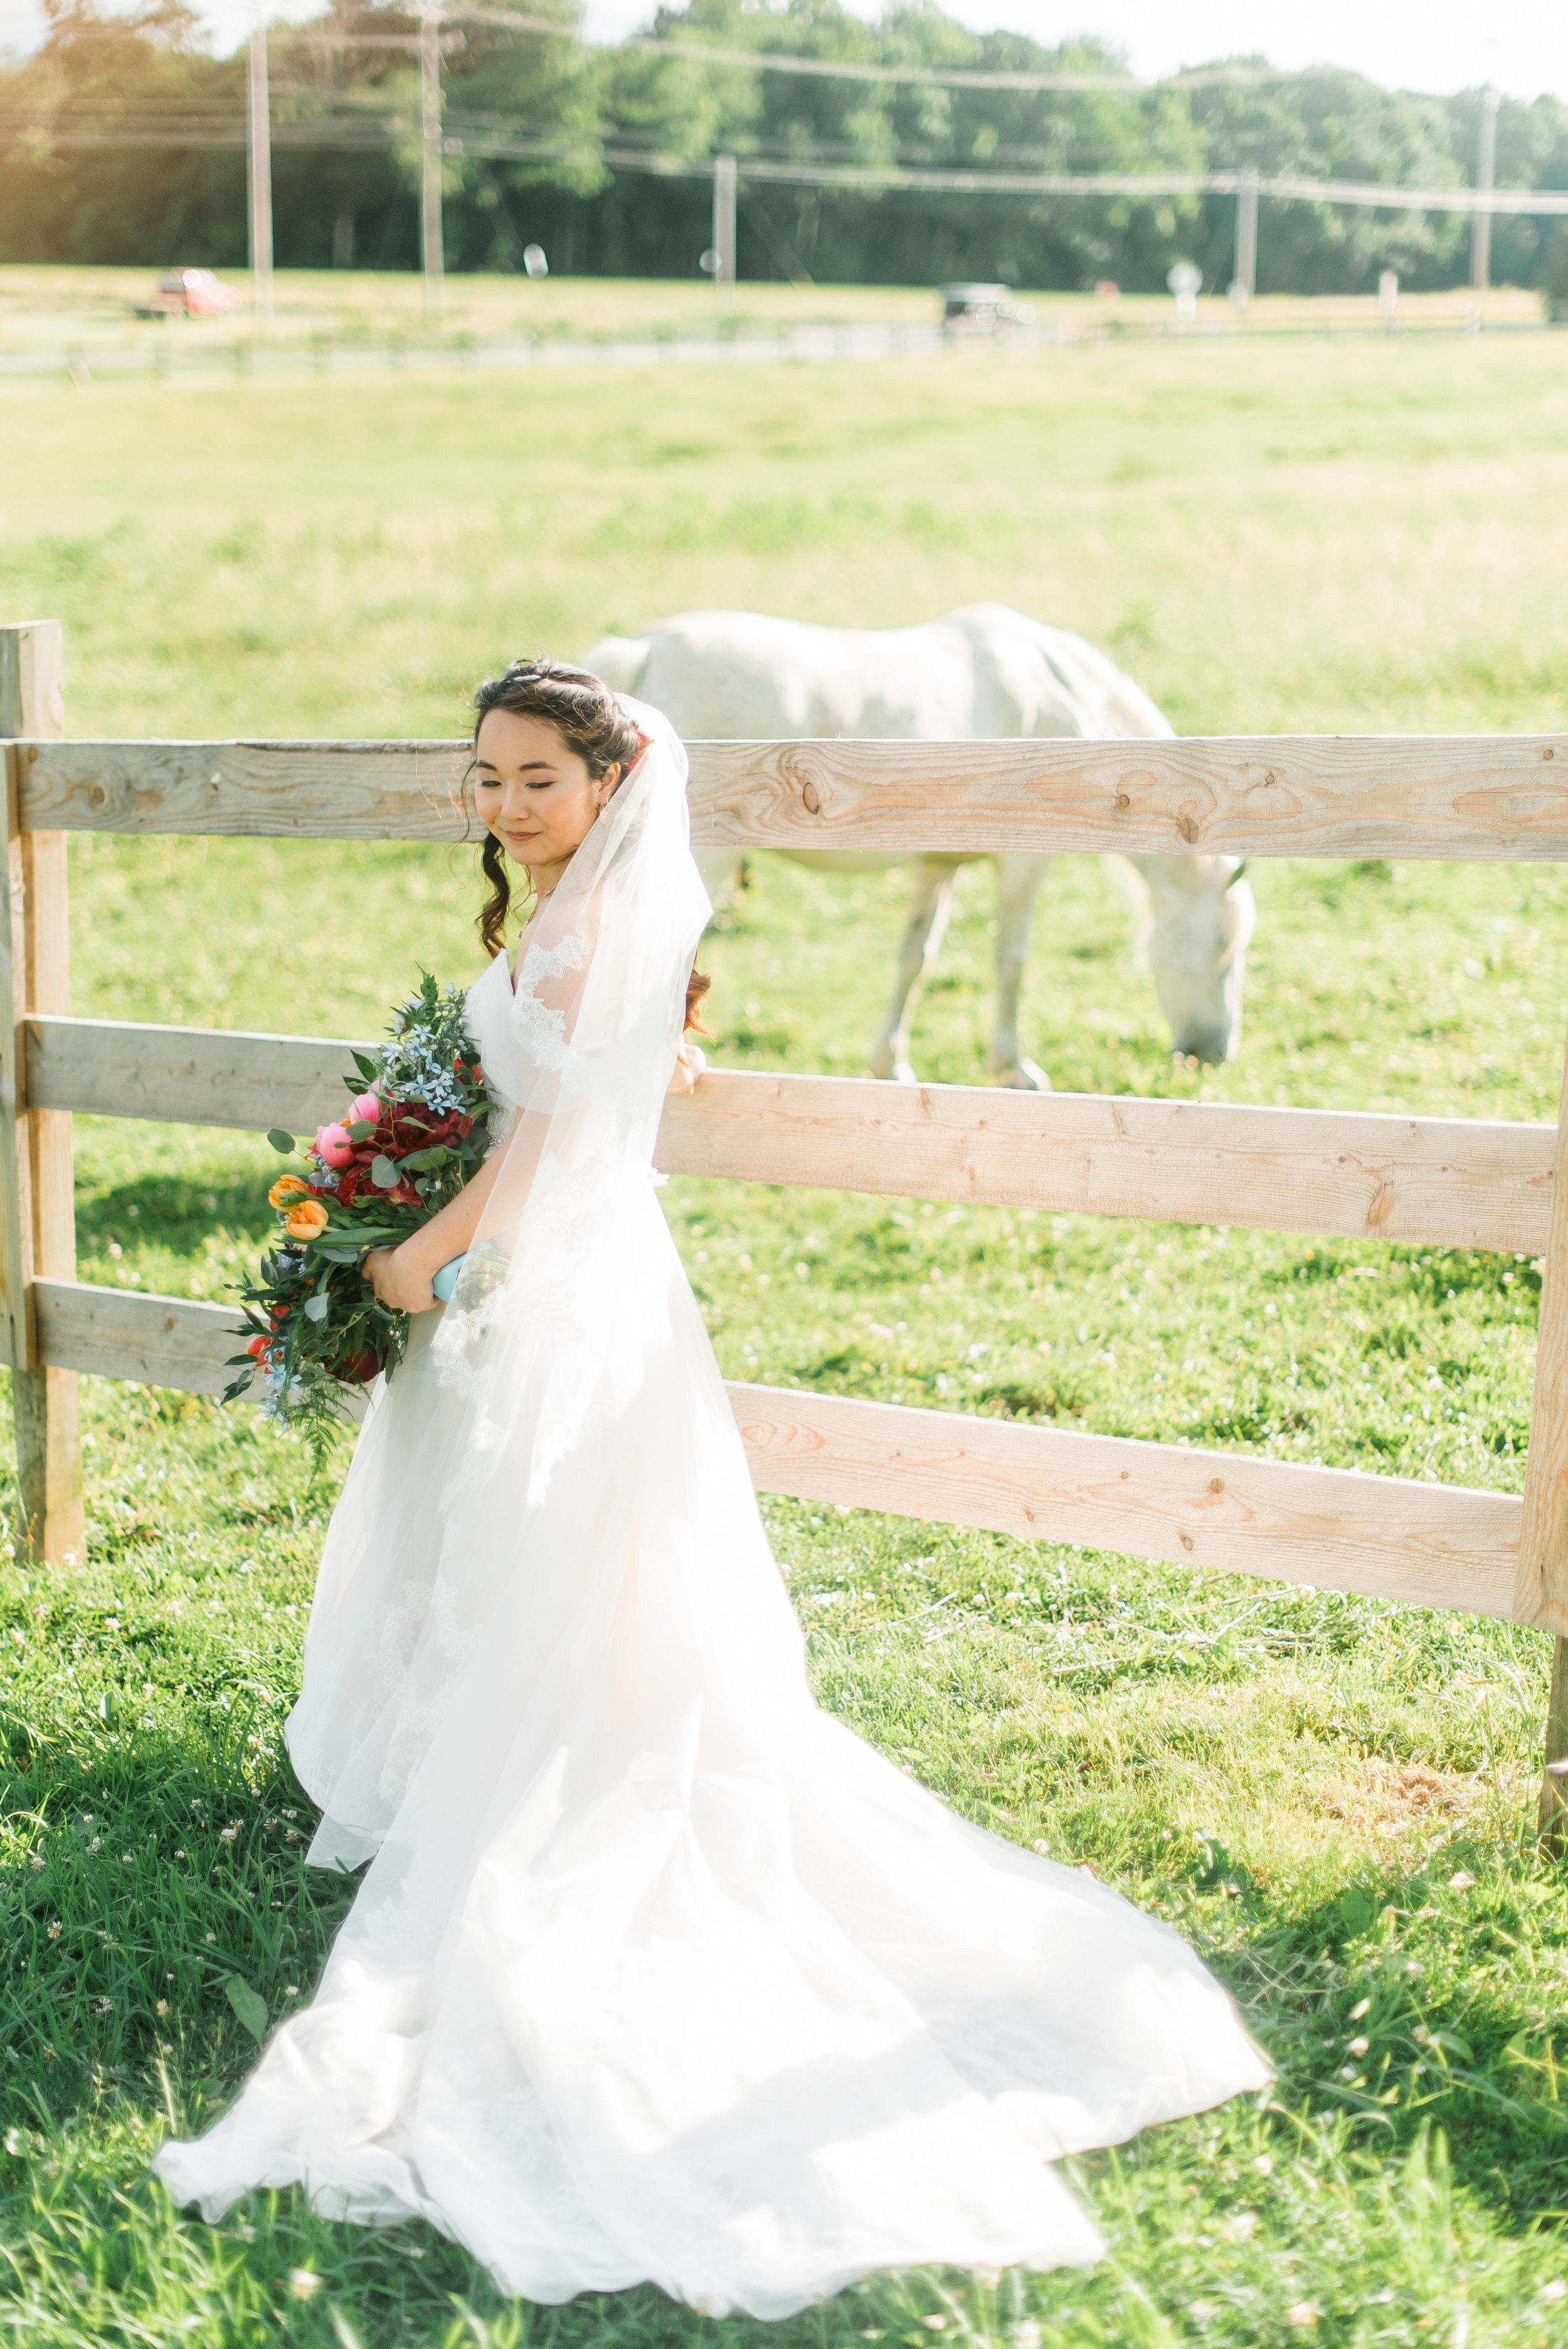 pittsburgh-wedding-photographer-rustic-acres-farm-summer-boho-wedding0016.jpg